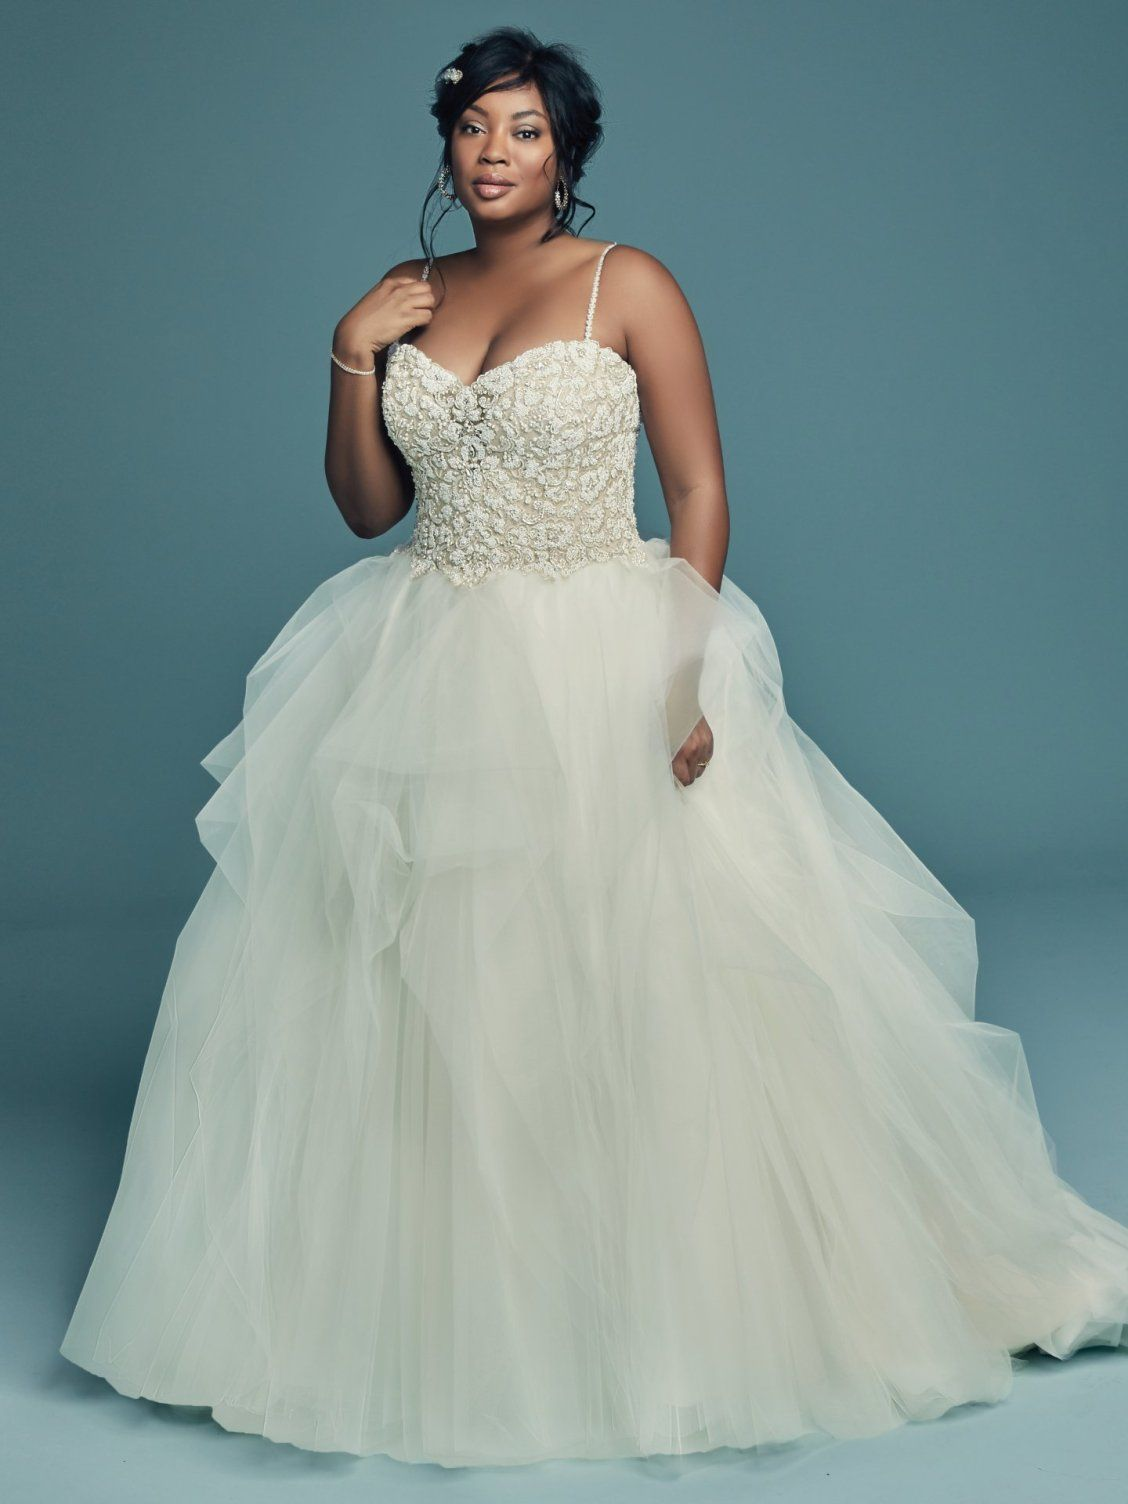 Wedding Dresses Bridal Gowns Ball Gown Wedding Dress Sweetheart Wedding Dress Maggie Sottero Wedding Dresses [ 1504 x 1128 Pixel ]